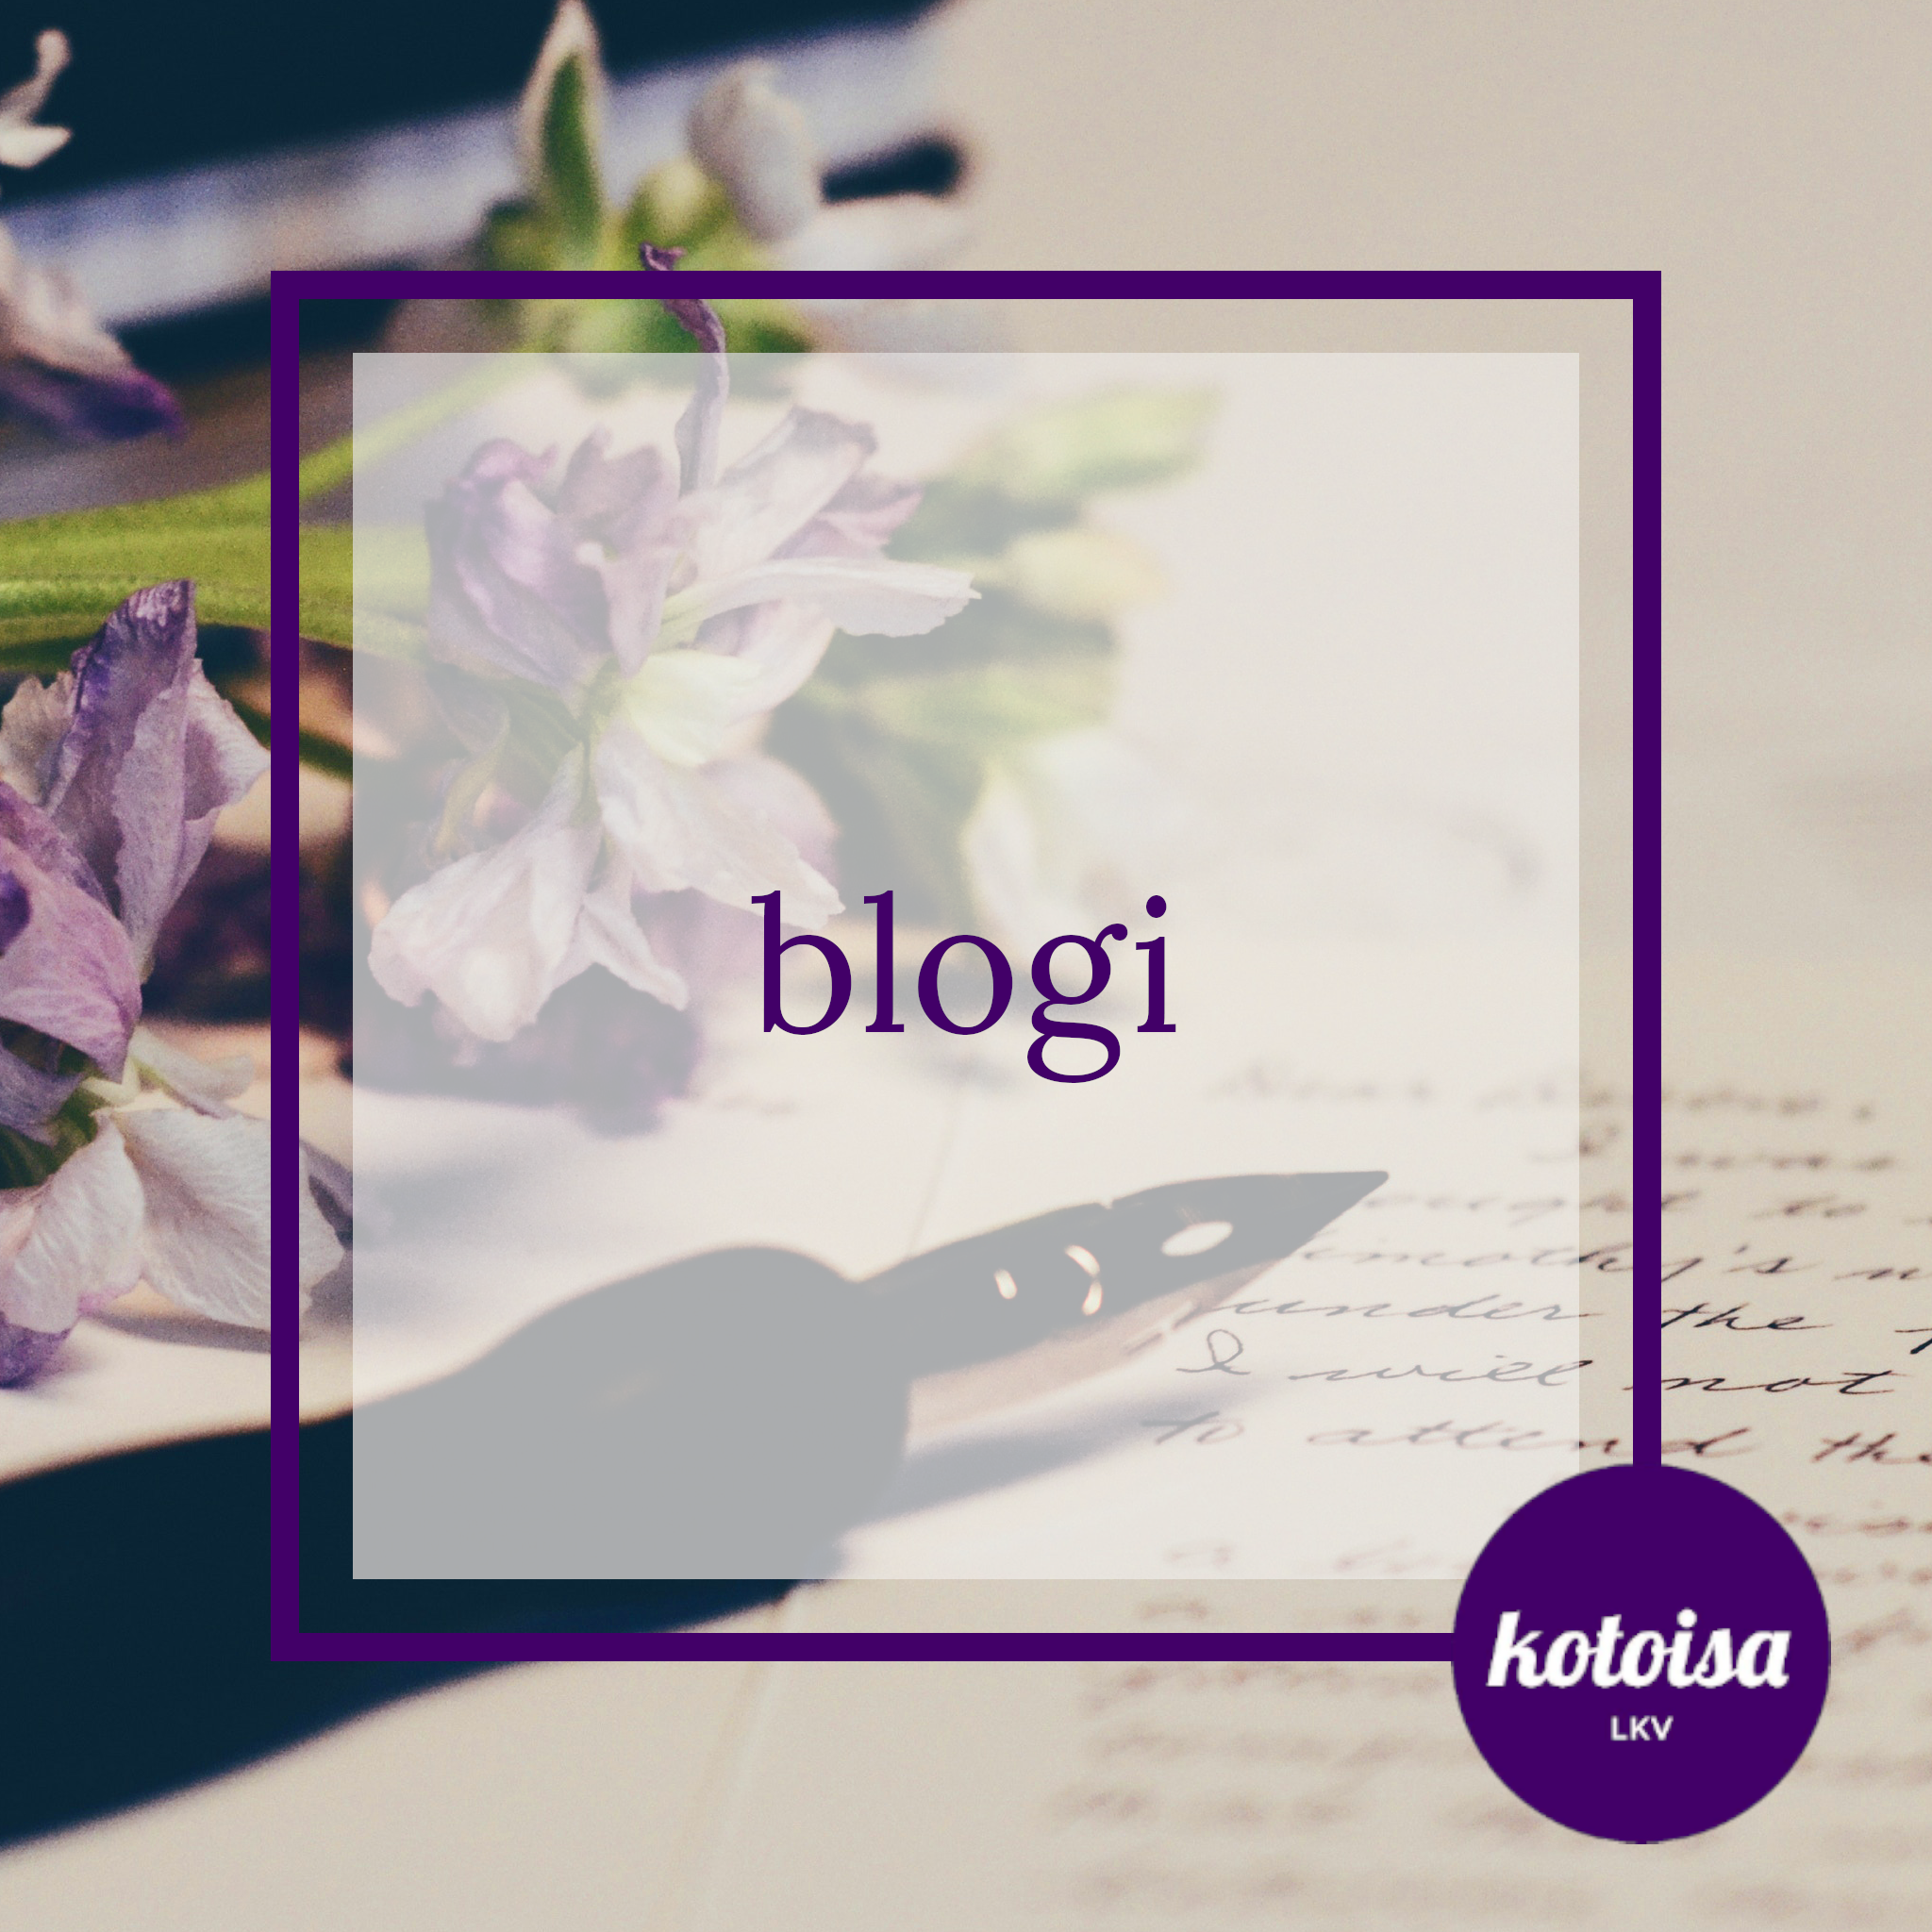 kotoisa_blogi_ig